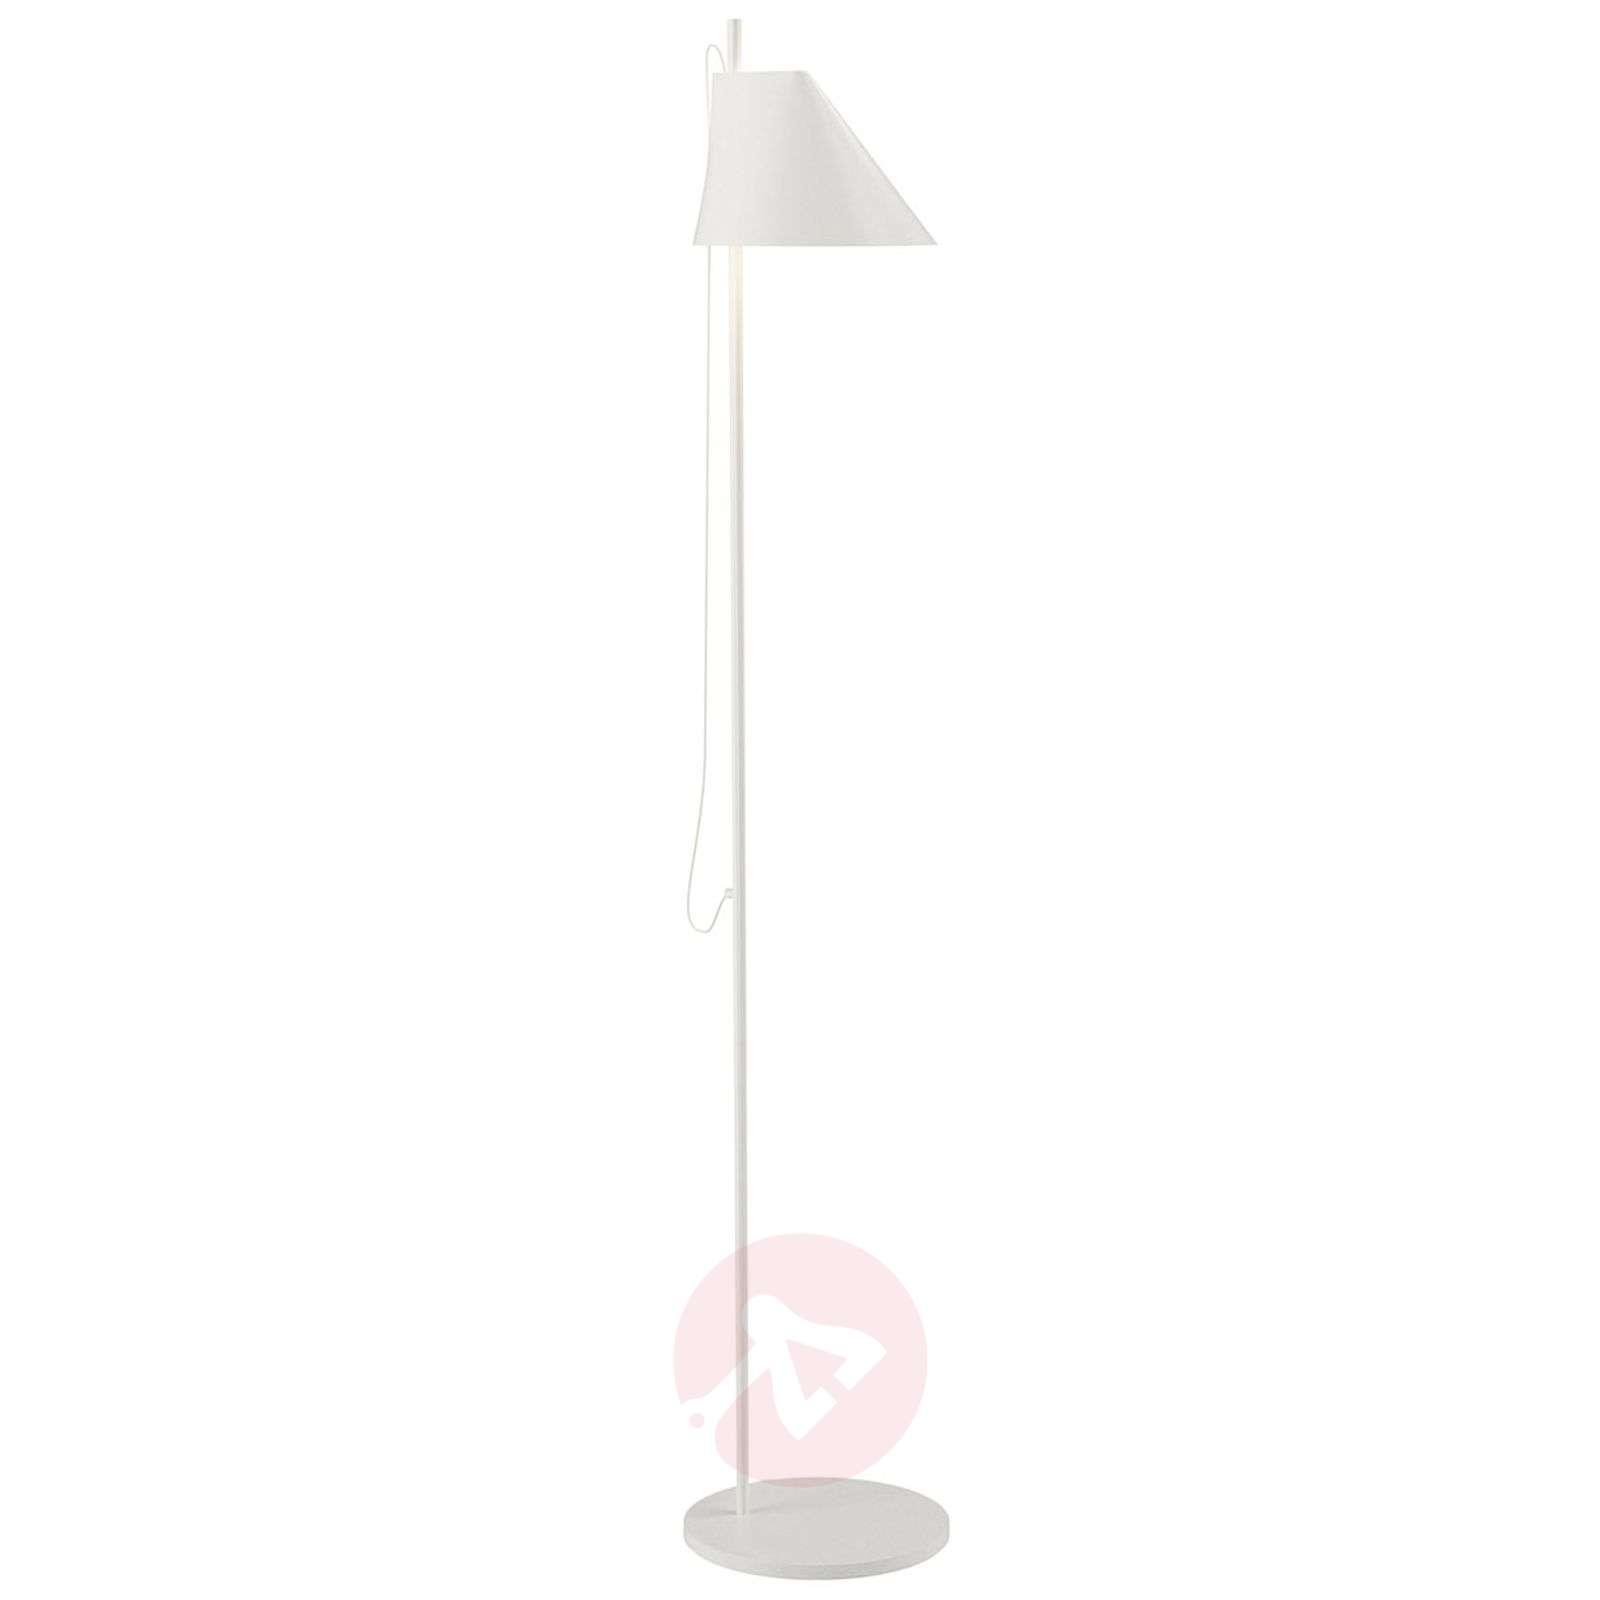 Louis Poulsen Yuh LED designer floor lamp-6090158X-01